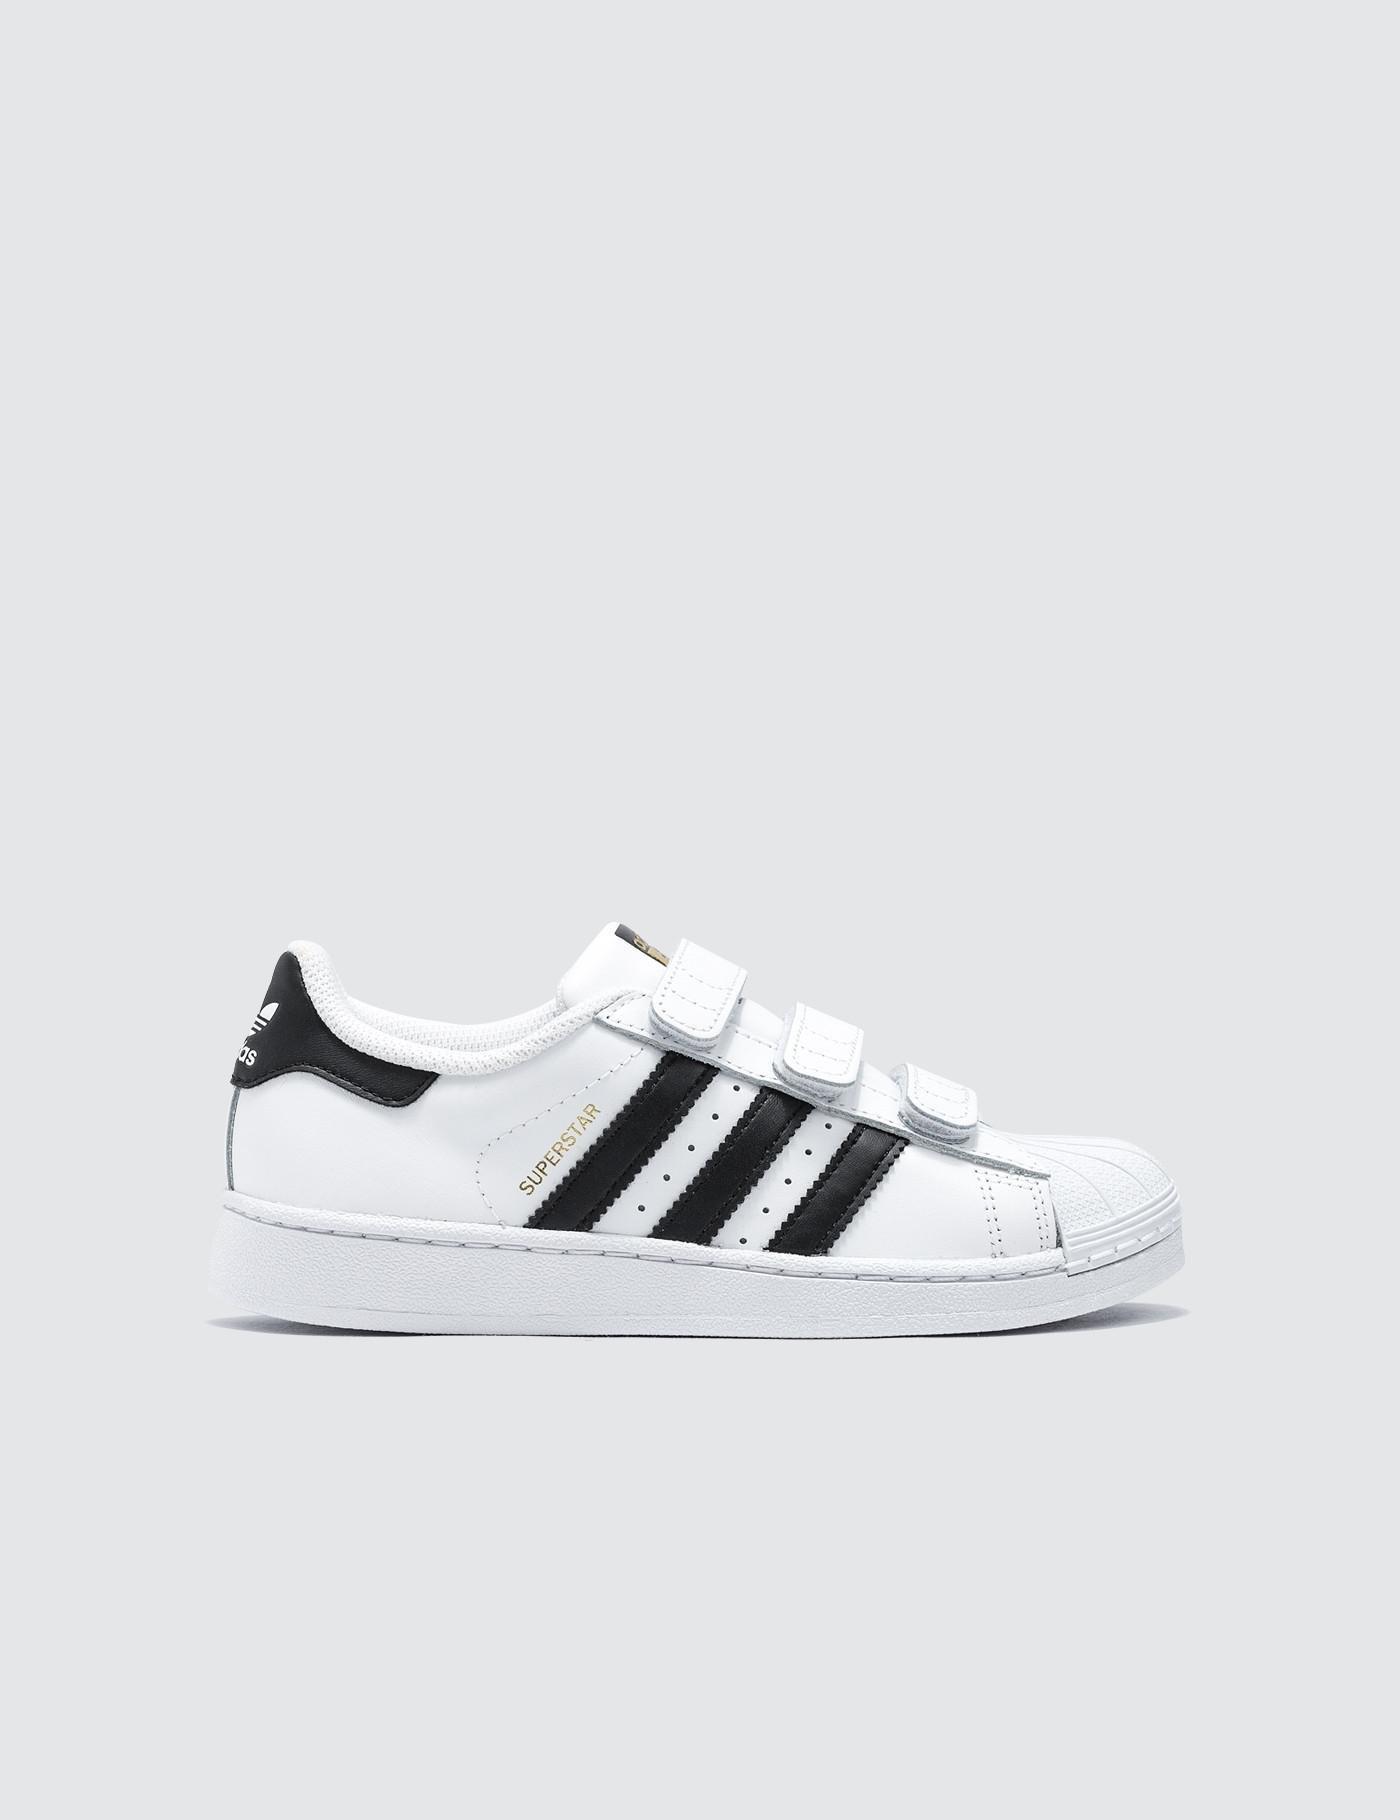 1bec2fd1770 adidas Originals Superstar Foundation Cf C in White for Men - Lyst